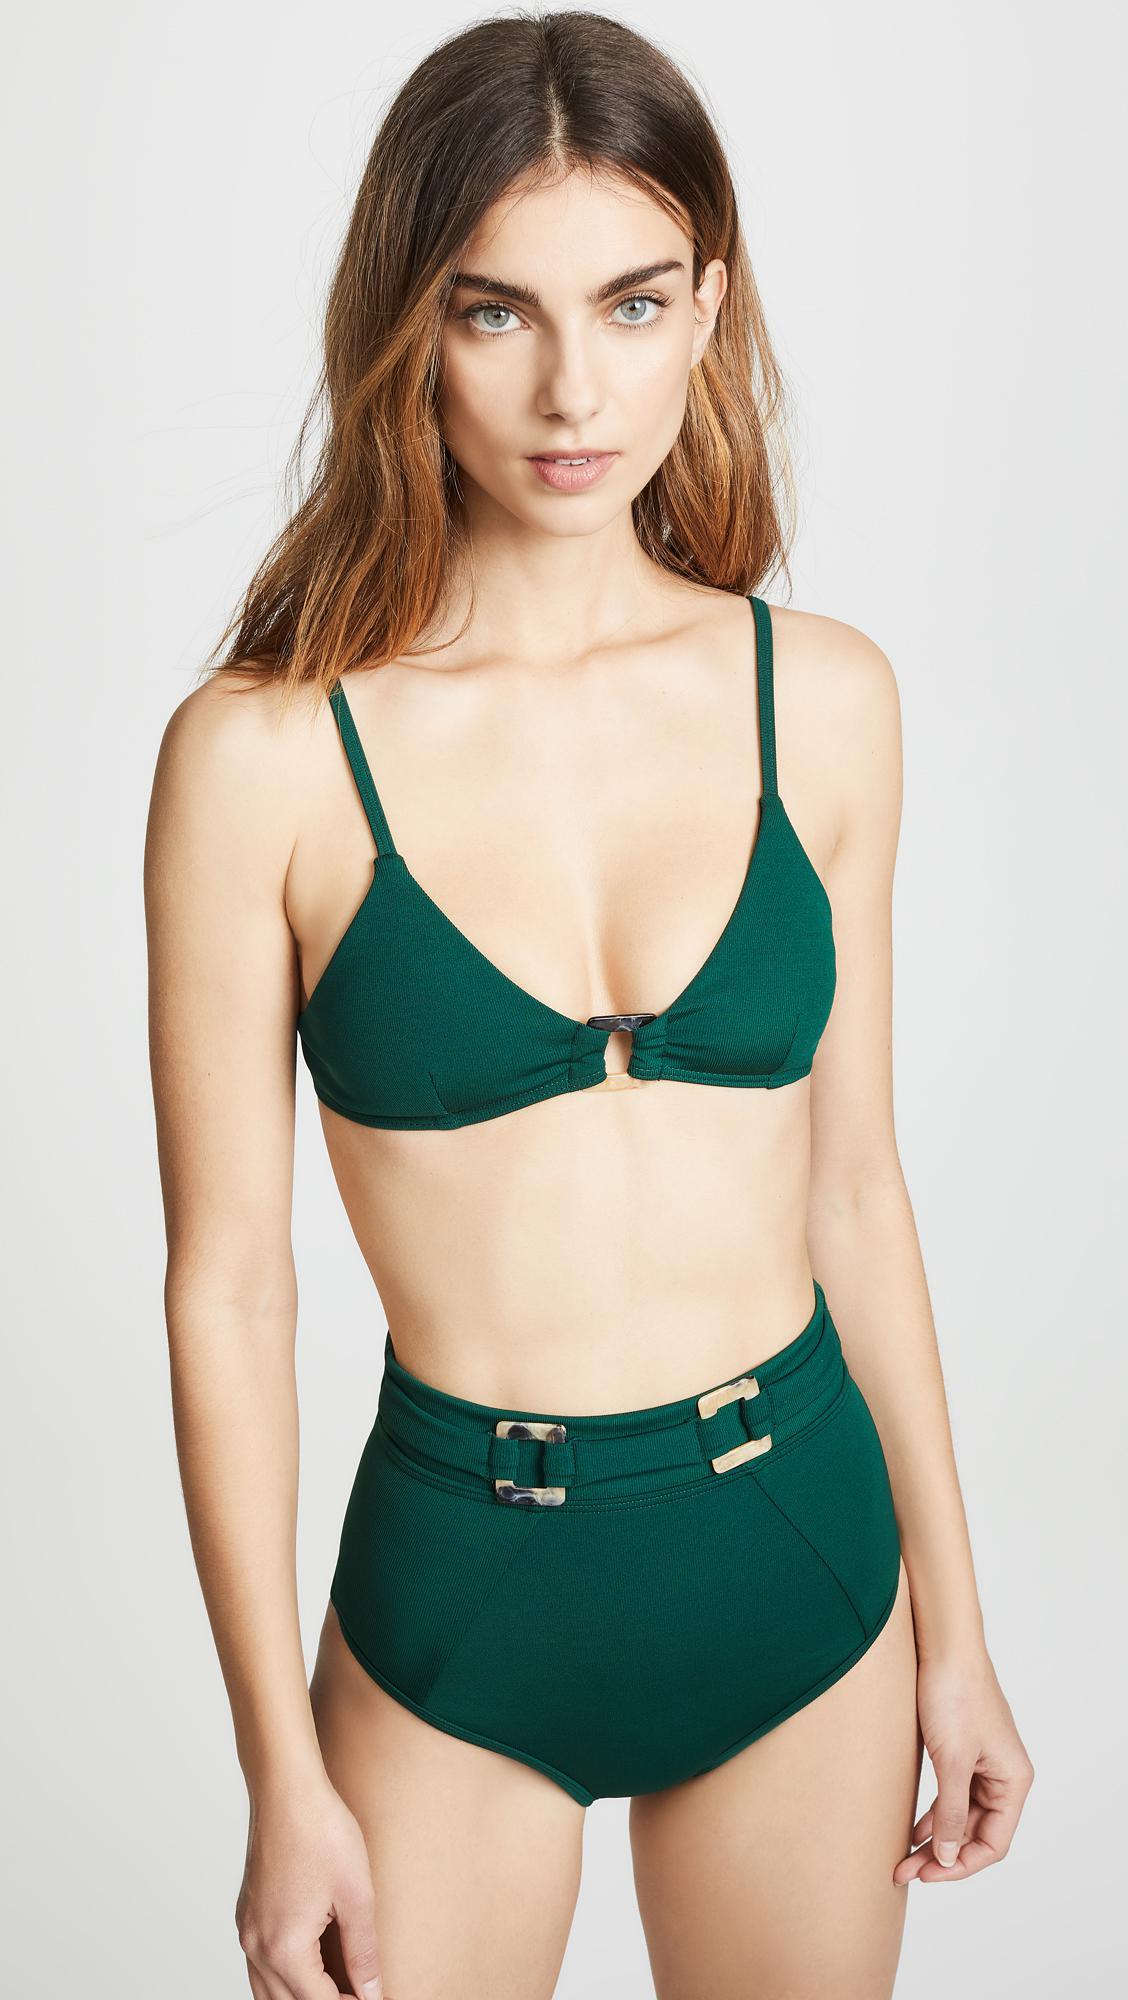 b5b3072bdc Lyst - Suboo Jungalow Ring Front Bralette Bikini Top in Green